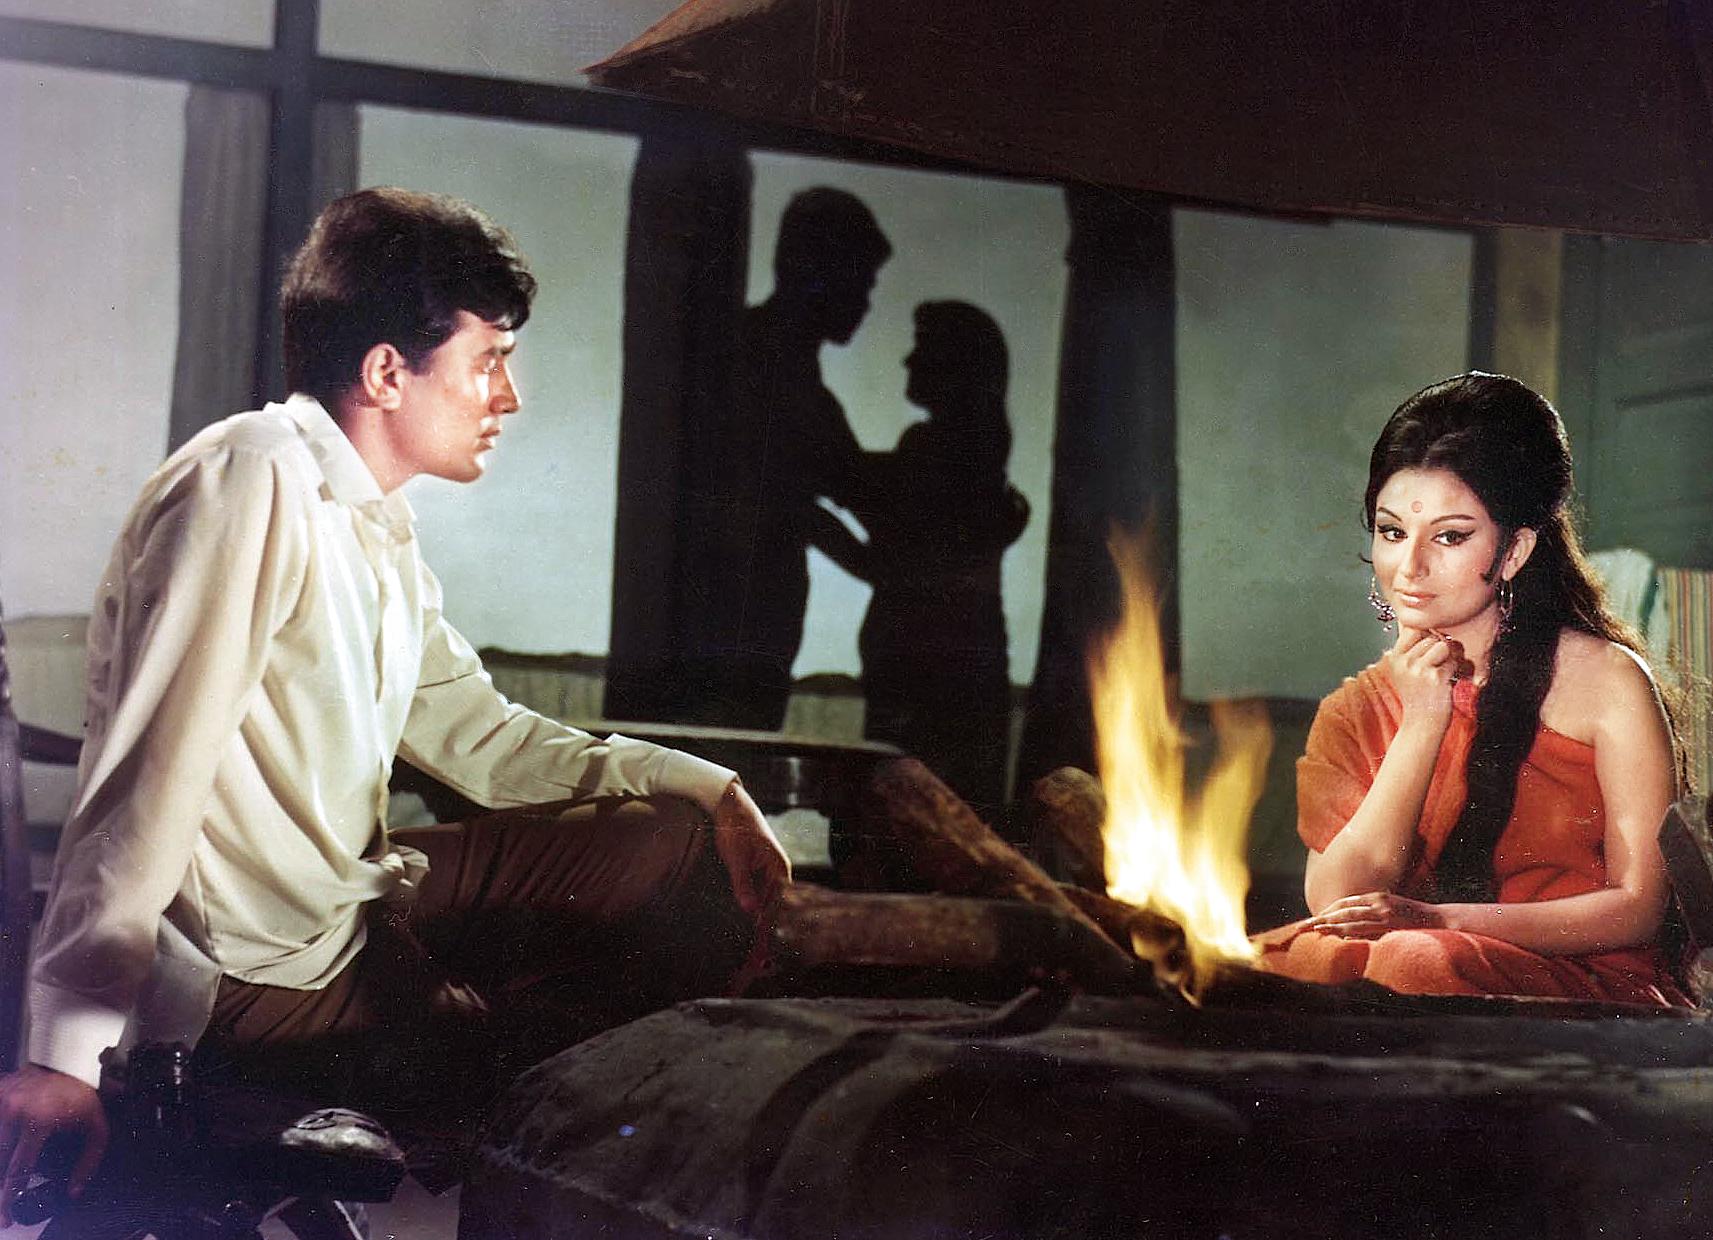 Rajesh Khanna and Sharmila in the Roop Tera Mastana sequence